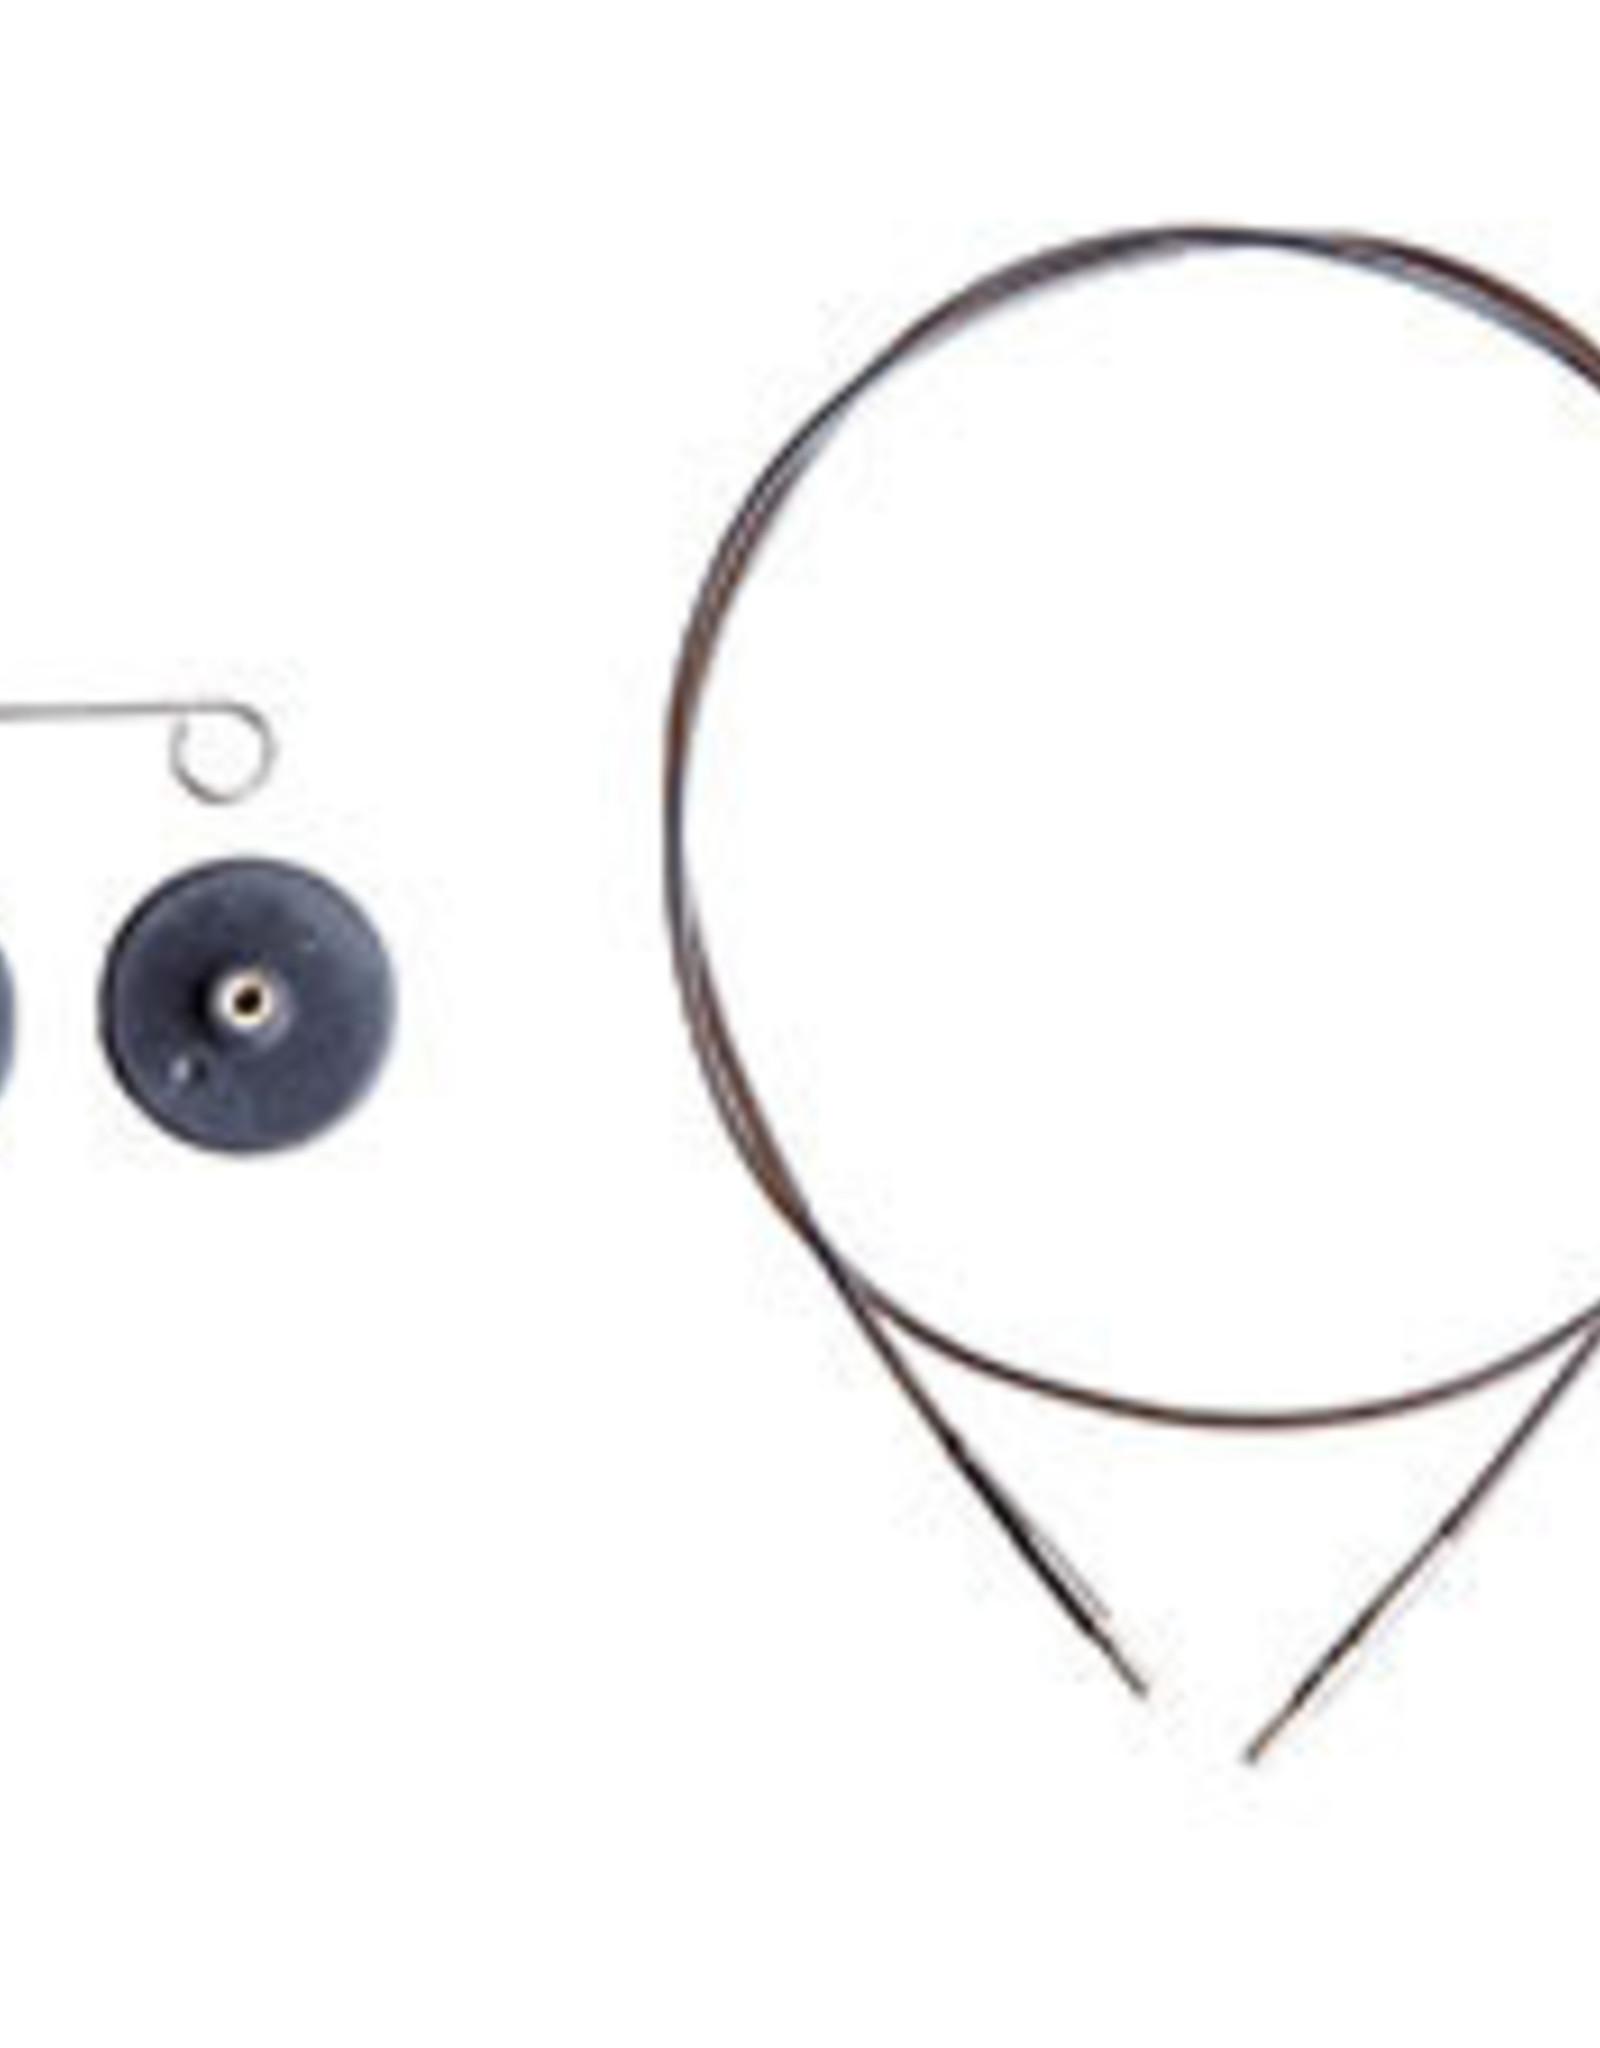 Knit Picks Câble interchangeable noir - Knit Picks